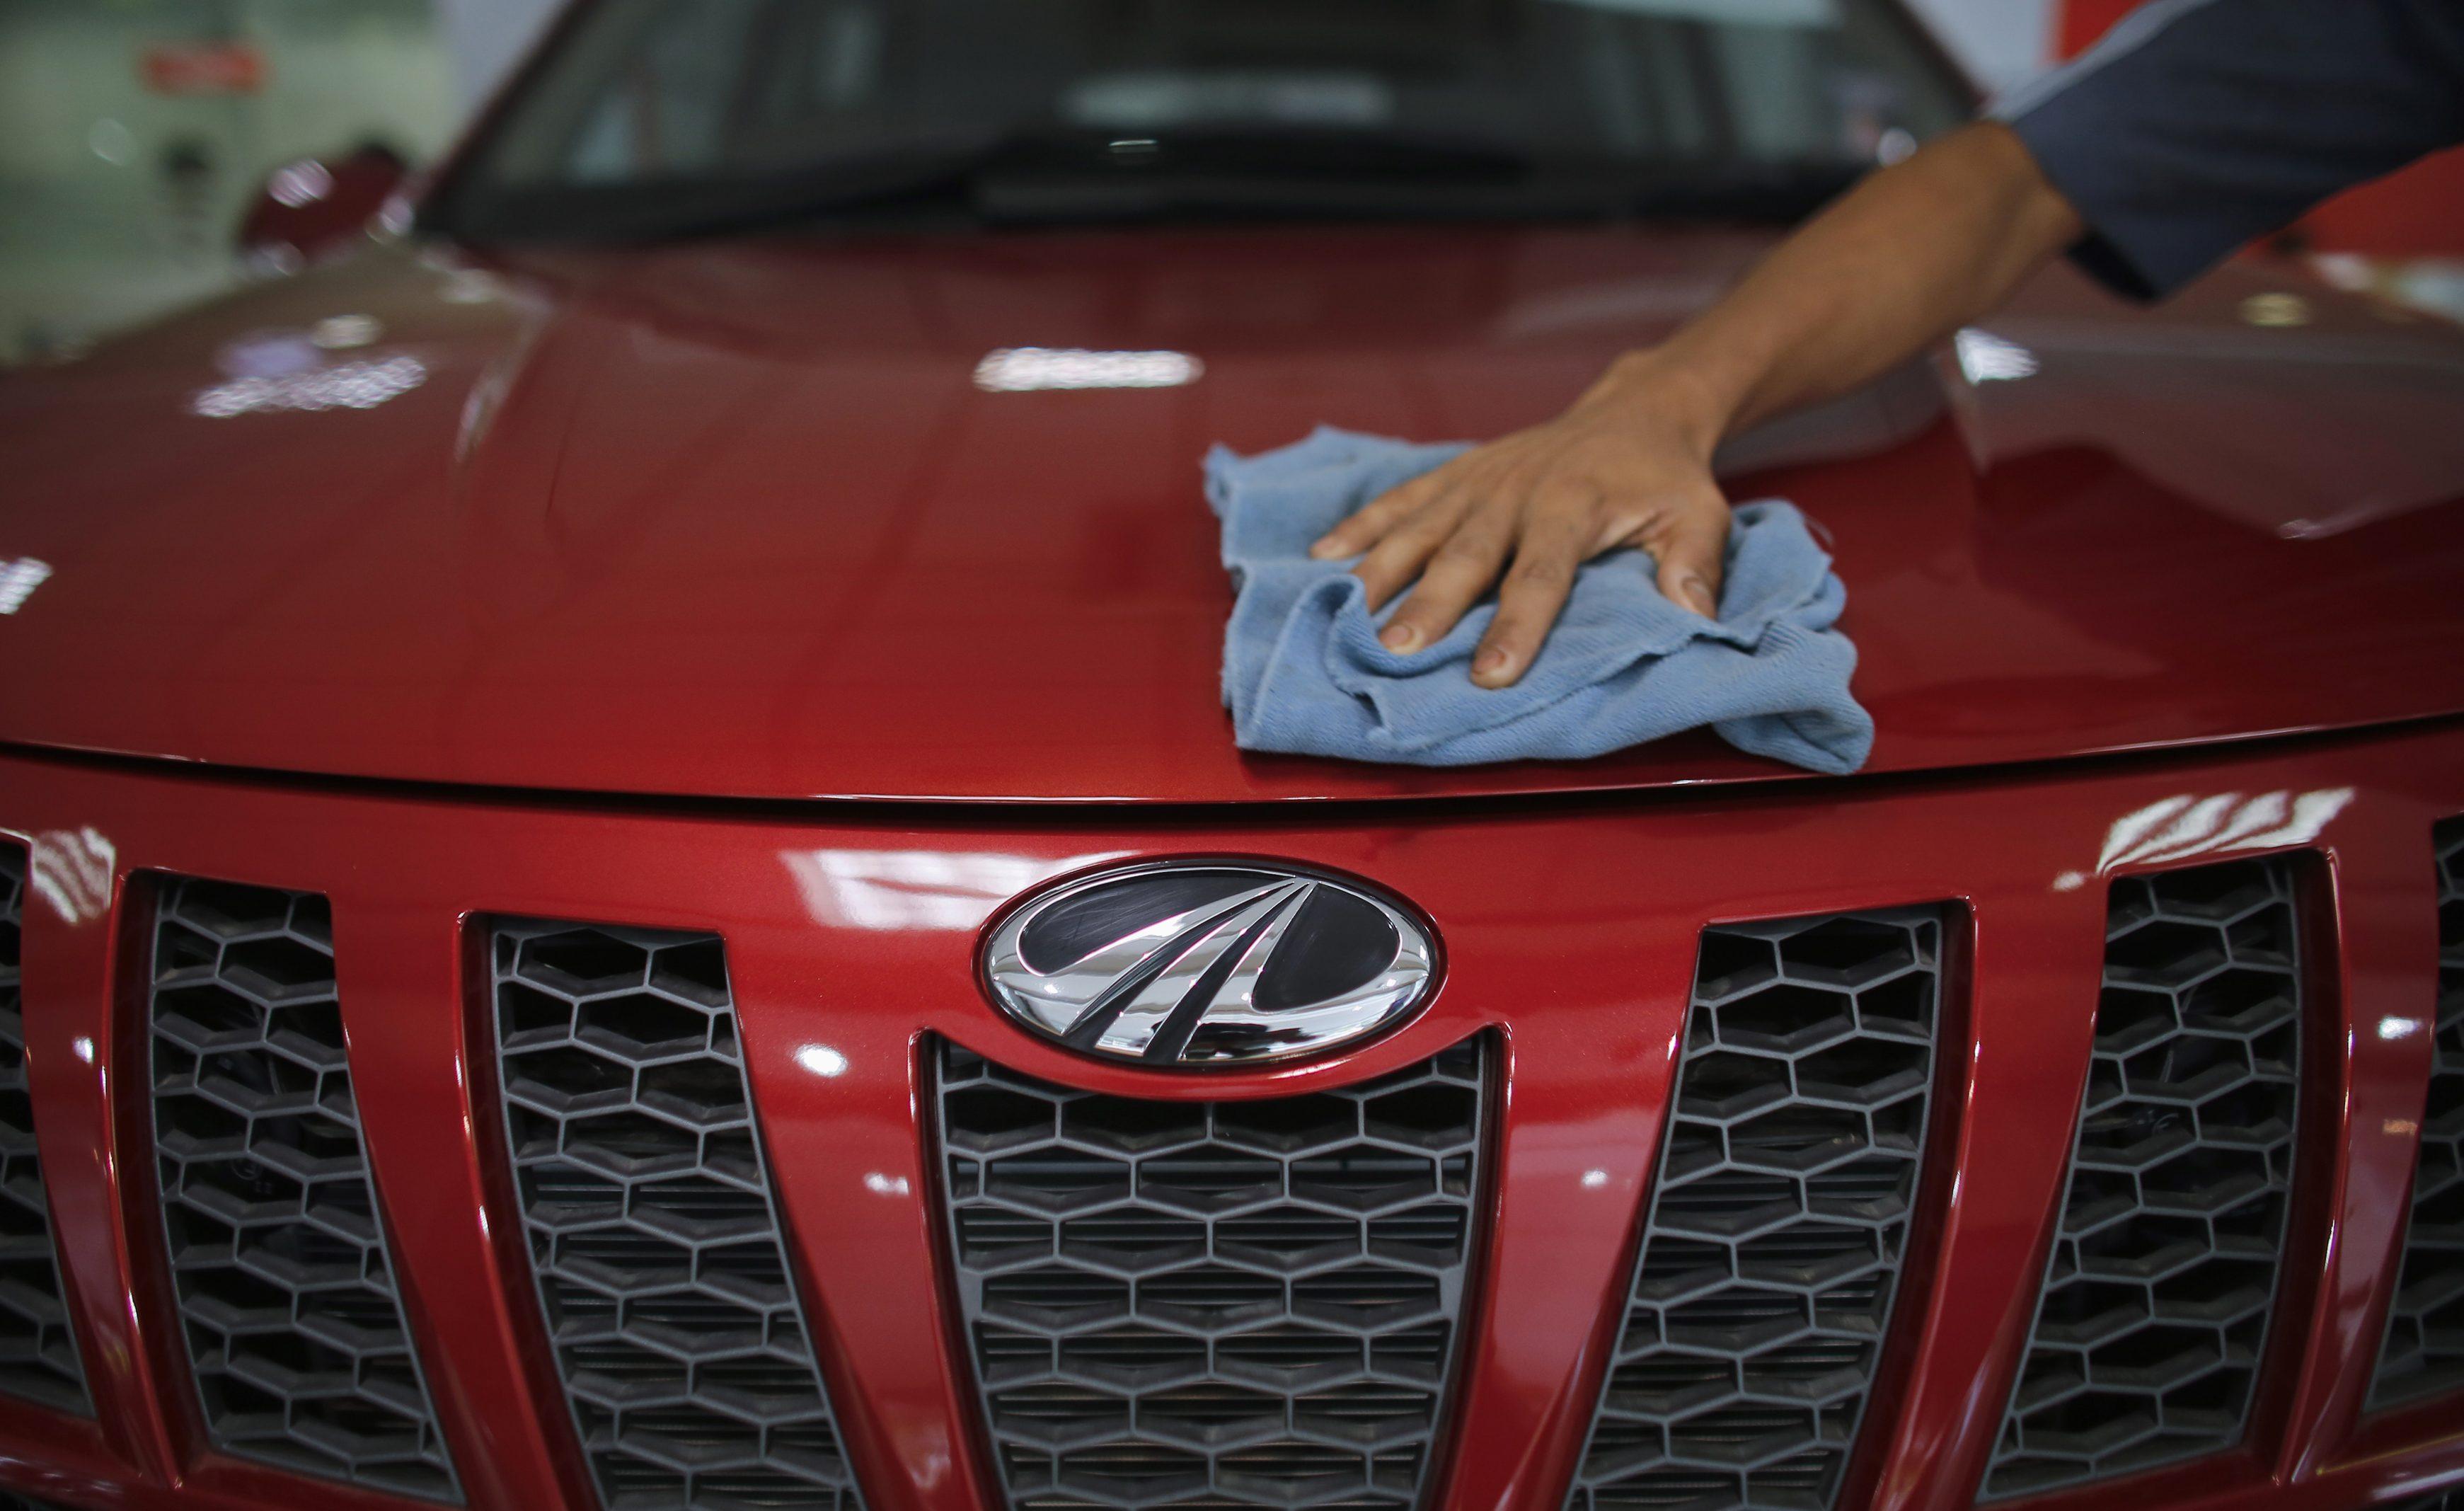 India's pre-owned cars boom has OLX, CarDekho, Cars24